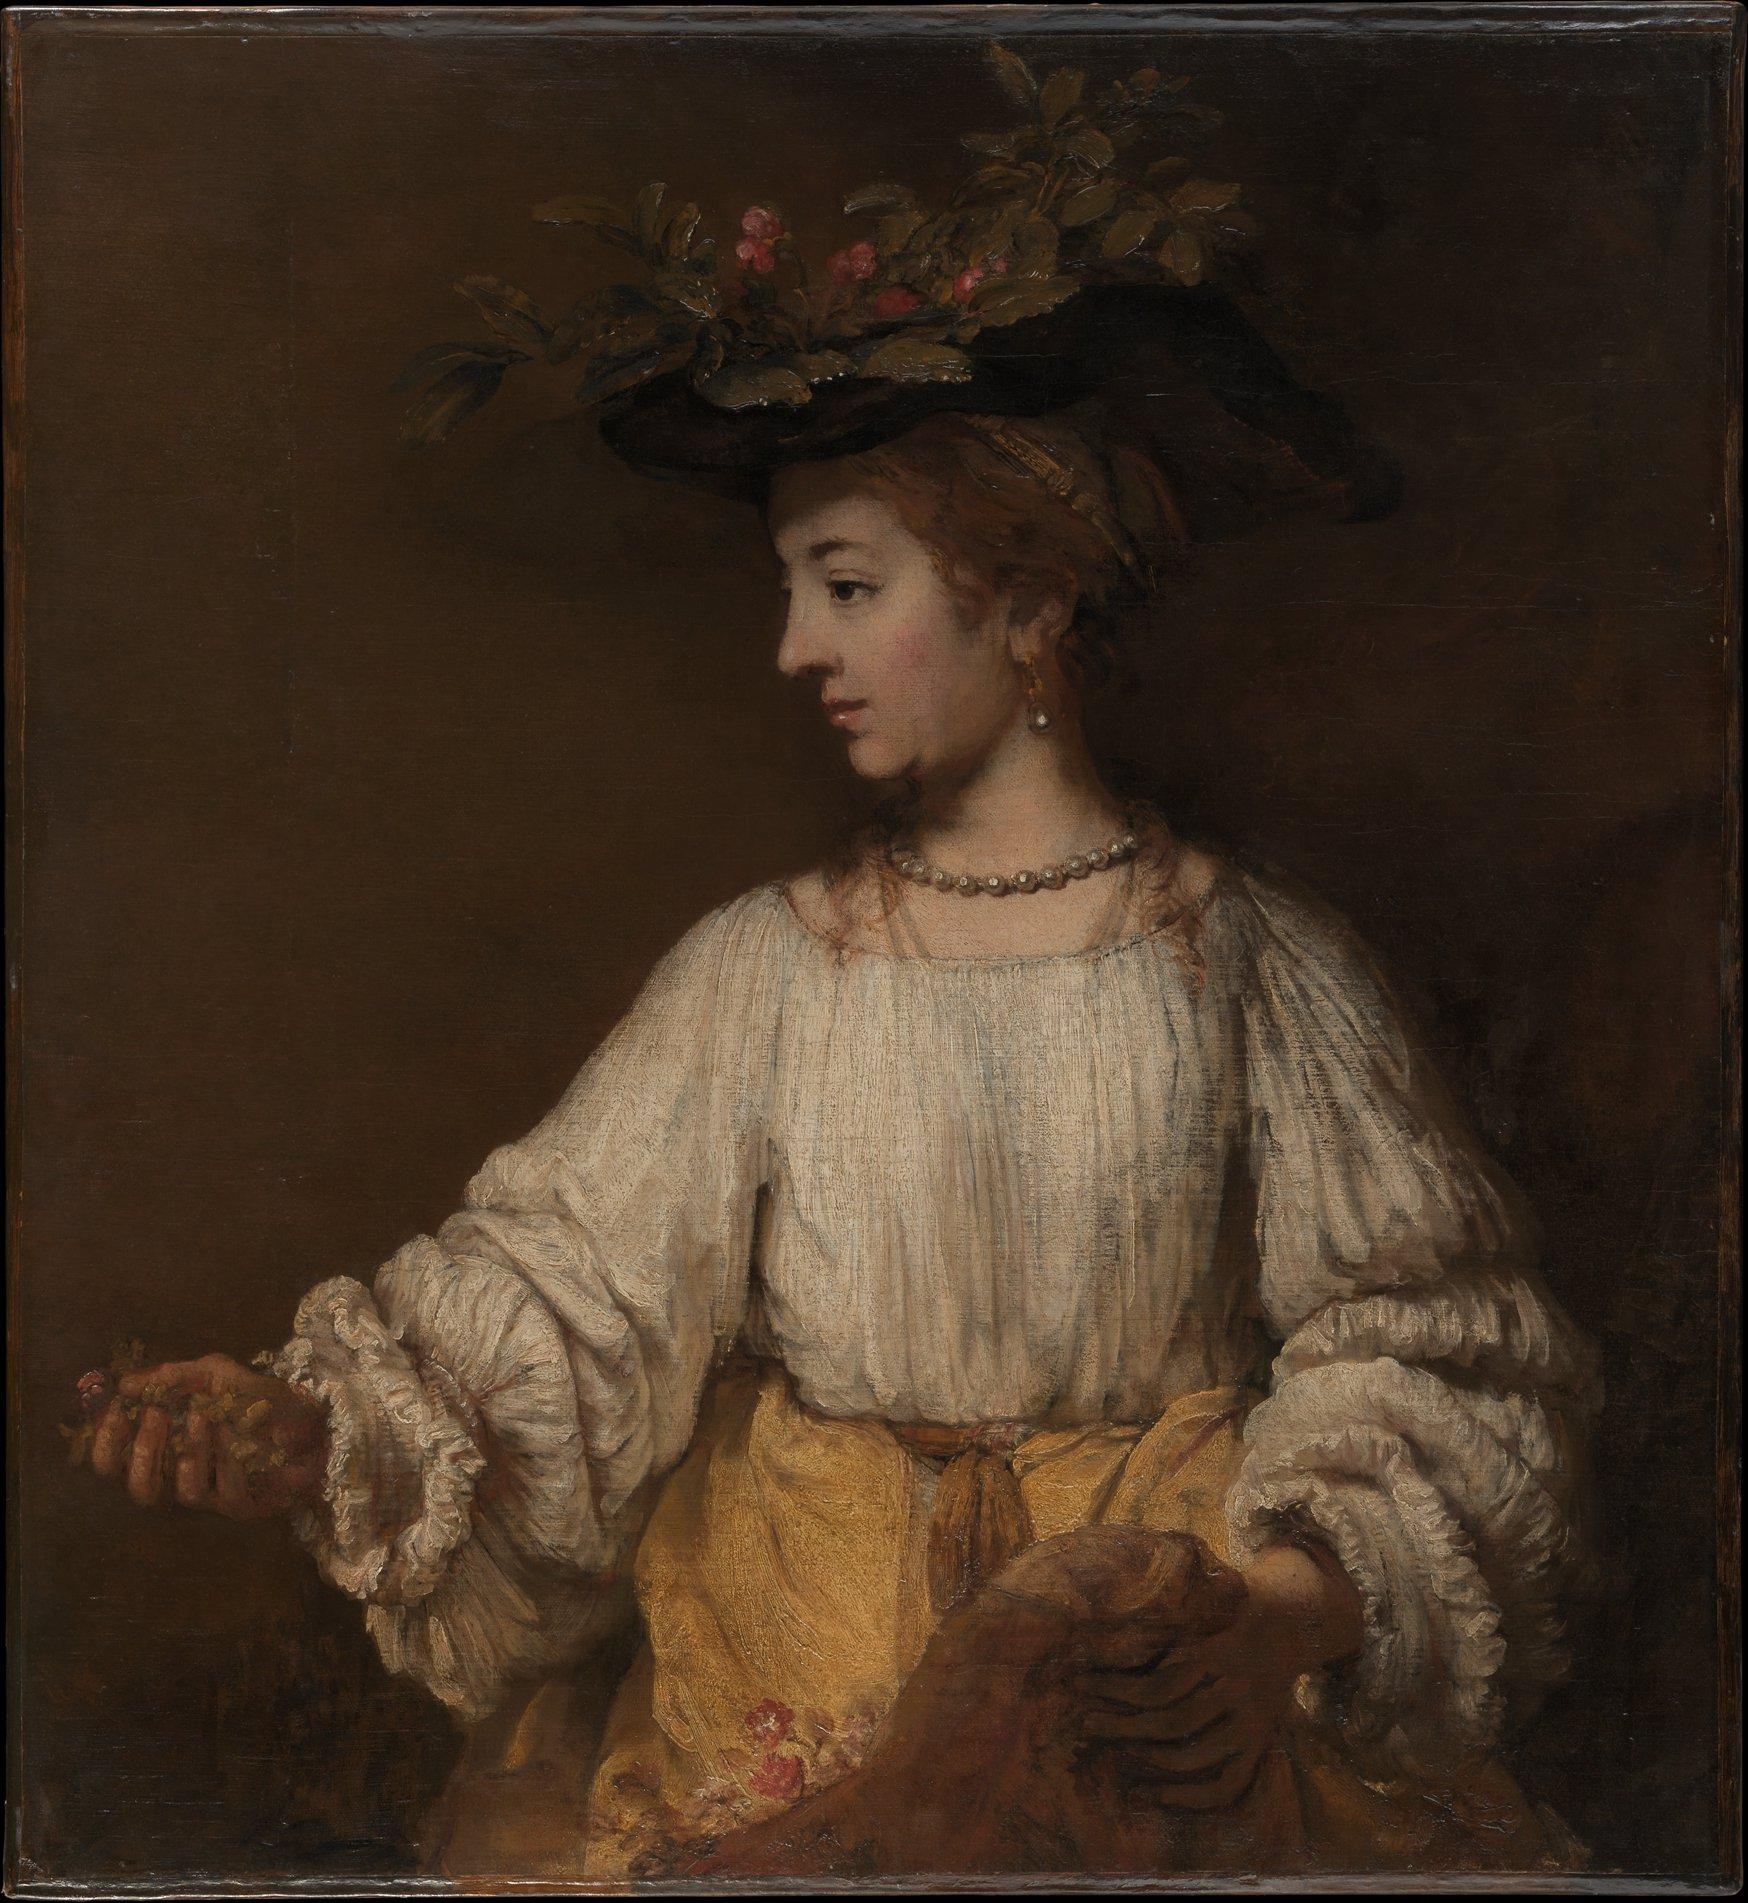 Flora, Rembrandt, Oil on canvas, ca. 1654, 39 3/8 x 36 1/8 in. (100 x 91.8 cm), The Metropolitan Museum of Art, fine art, london, london fine art studios, oil painting workshops, art classes london, classical art, chiaroscuro